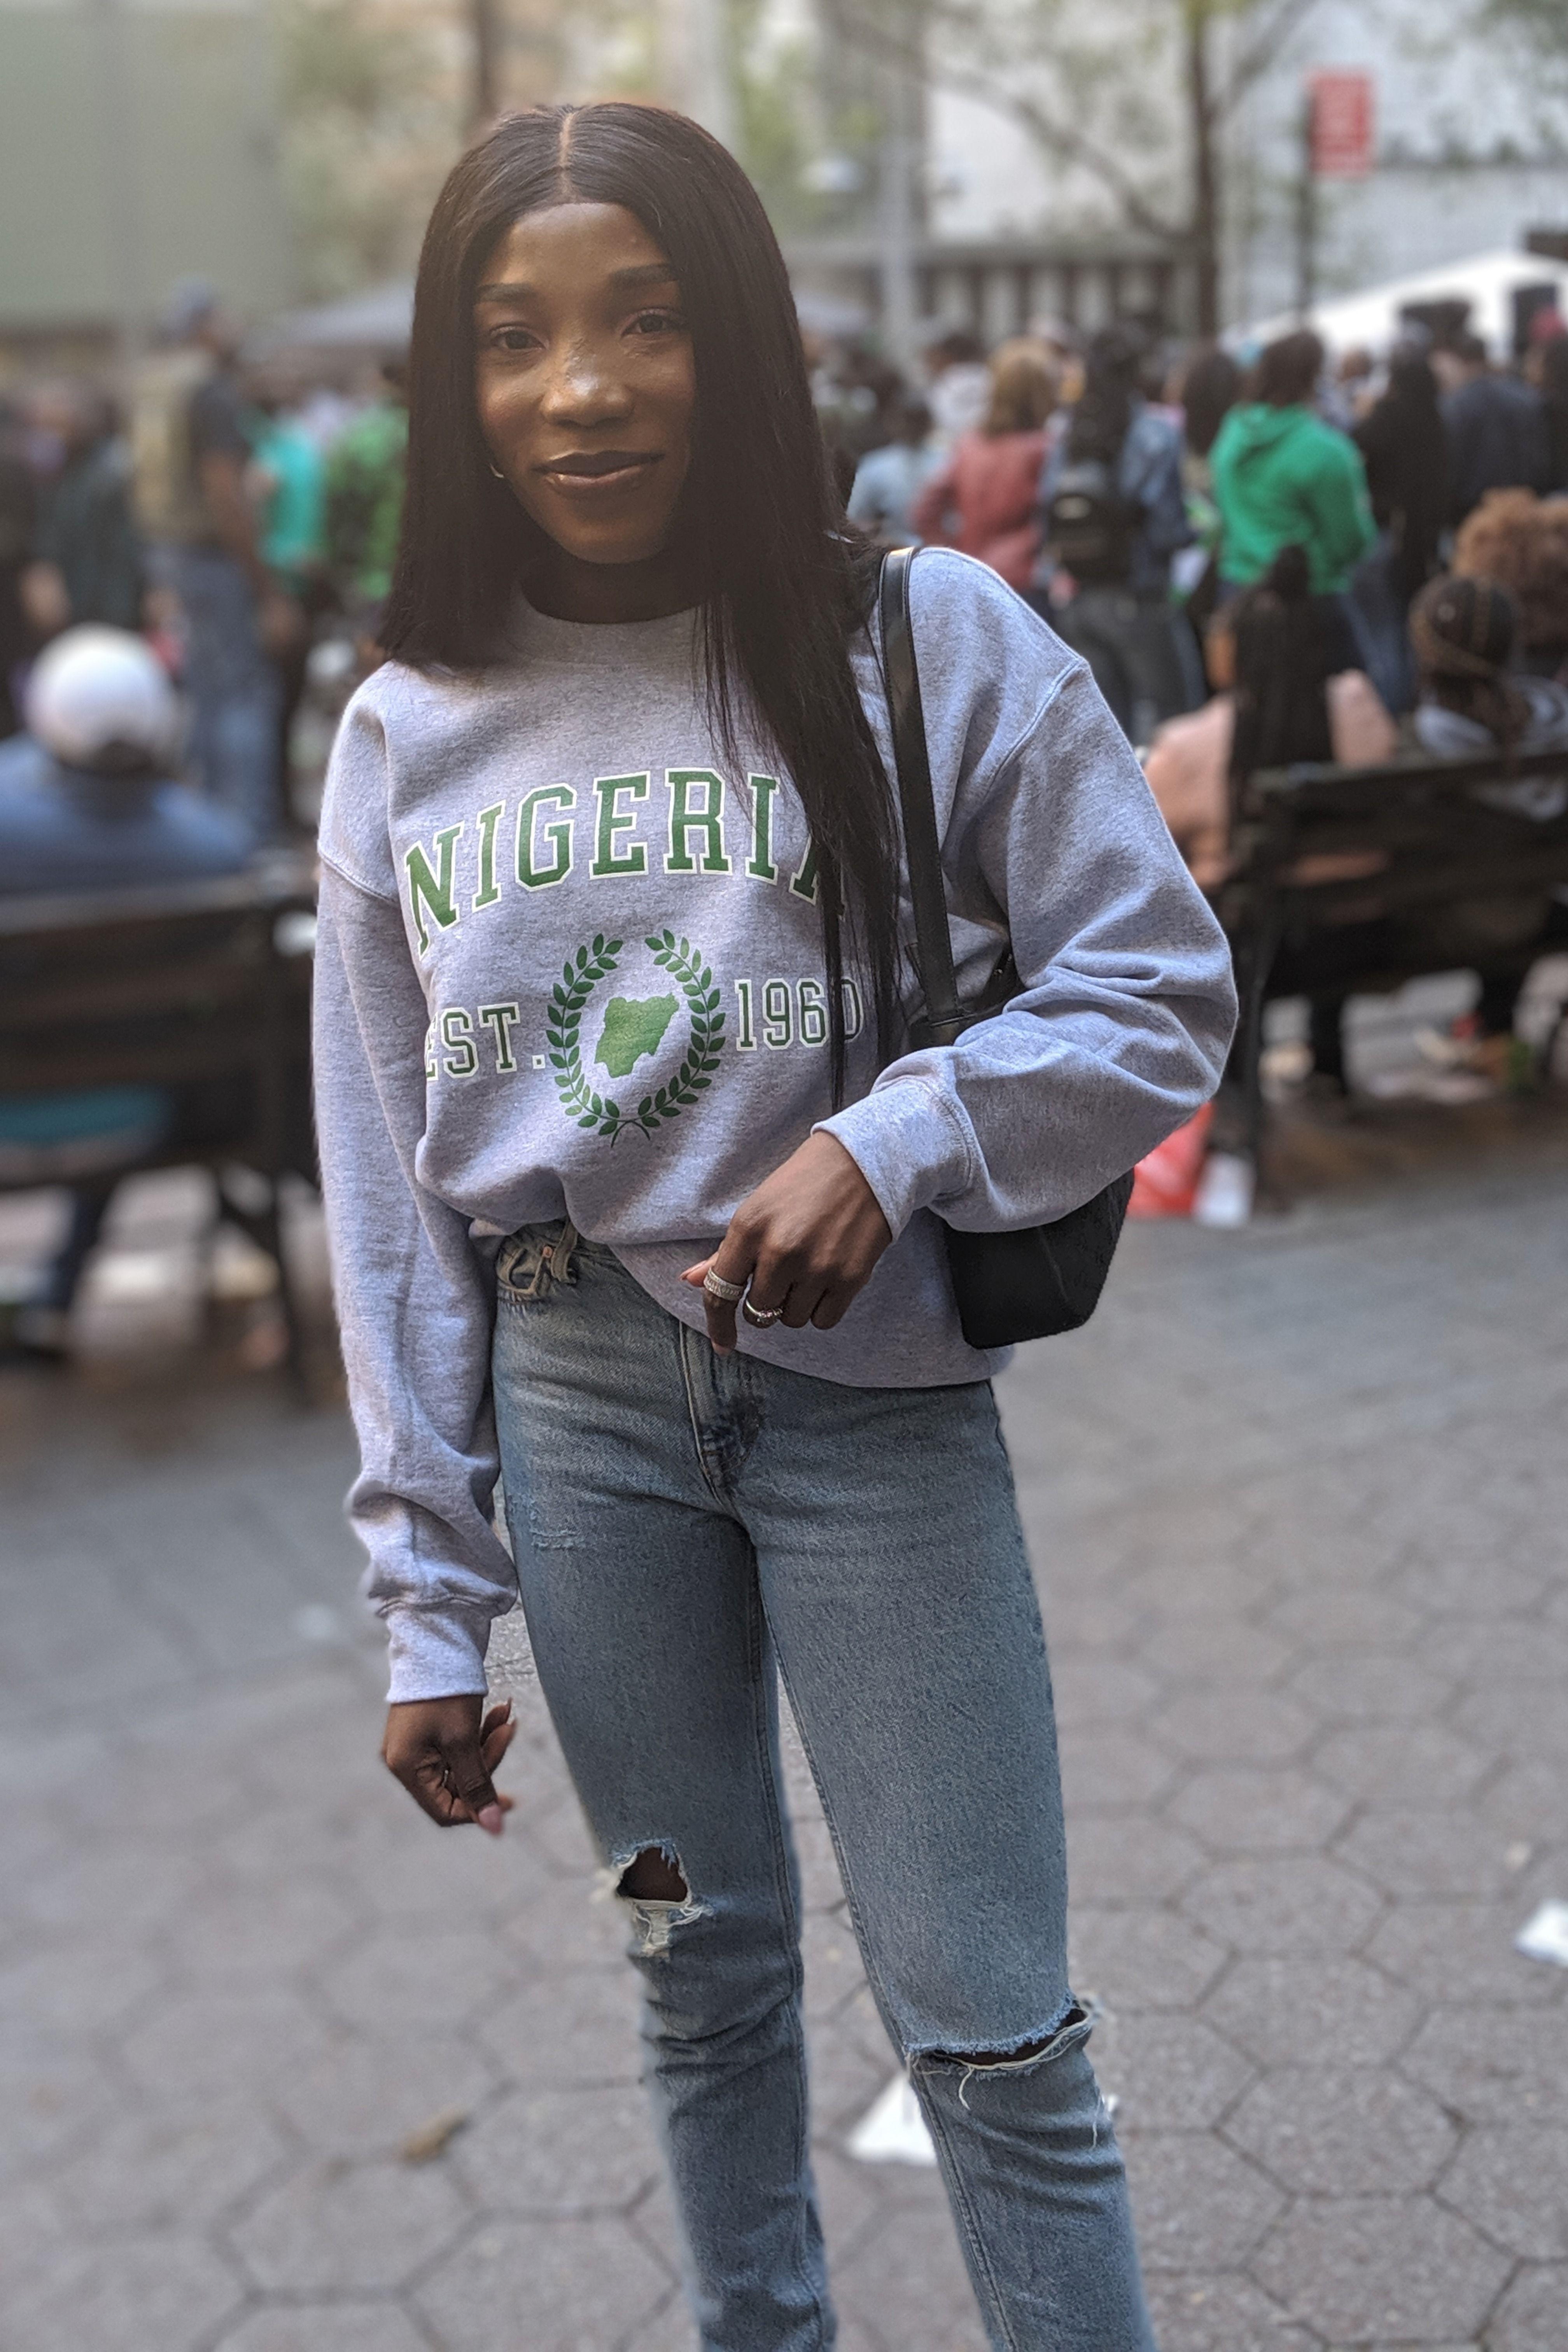 Nigerian Crewneck Sweatshirt Native Pikin African Men Fashion Black Girl Fashion African Clothing [ 6048 x 4032 Pixel ]